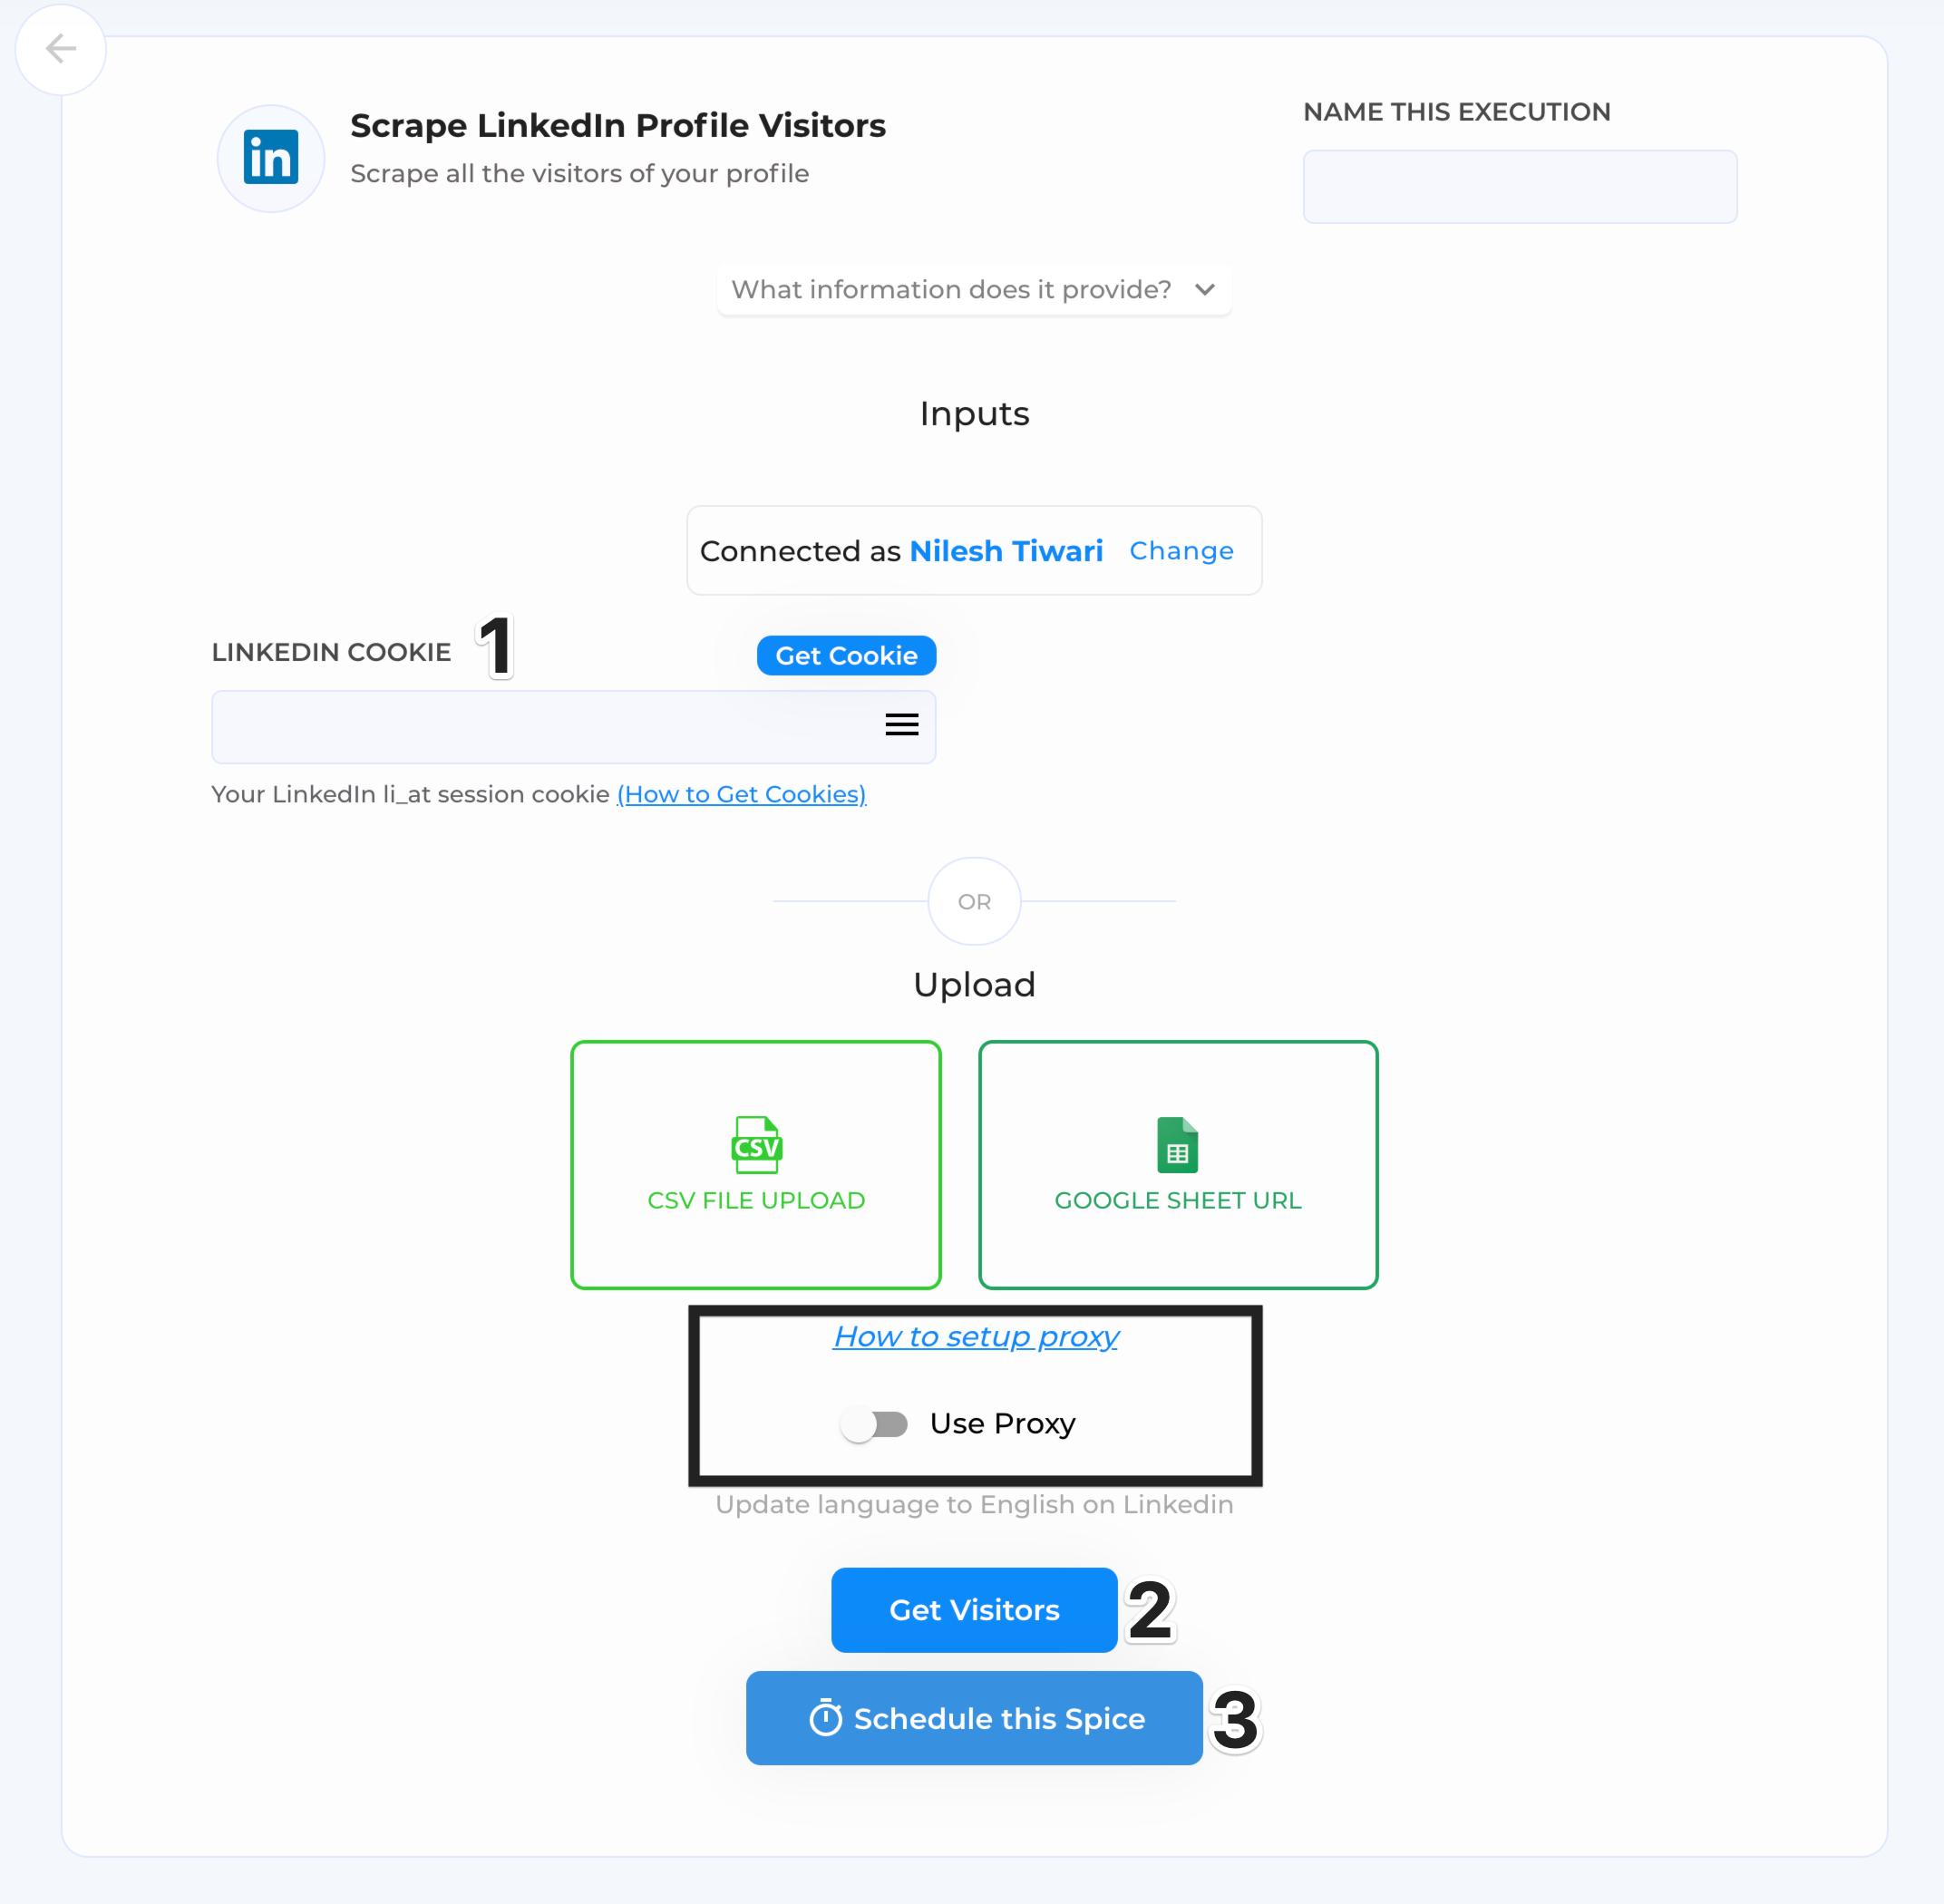 get profile visitors execution window